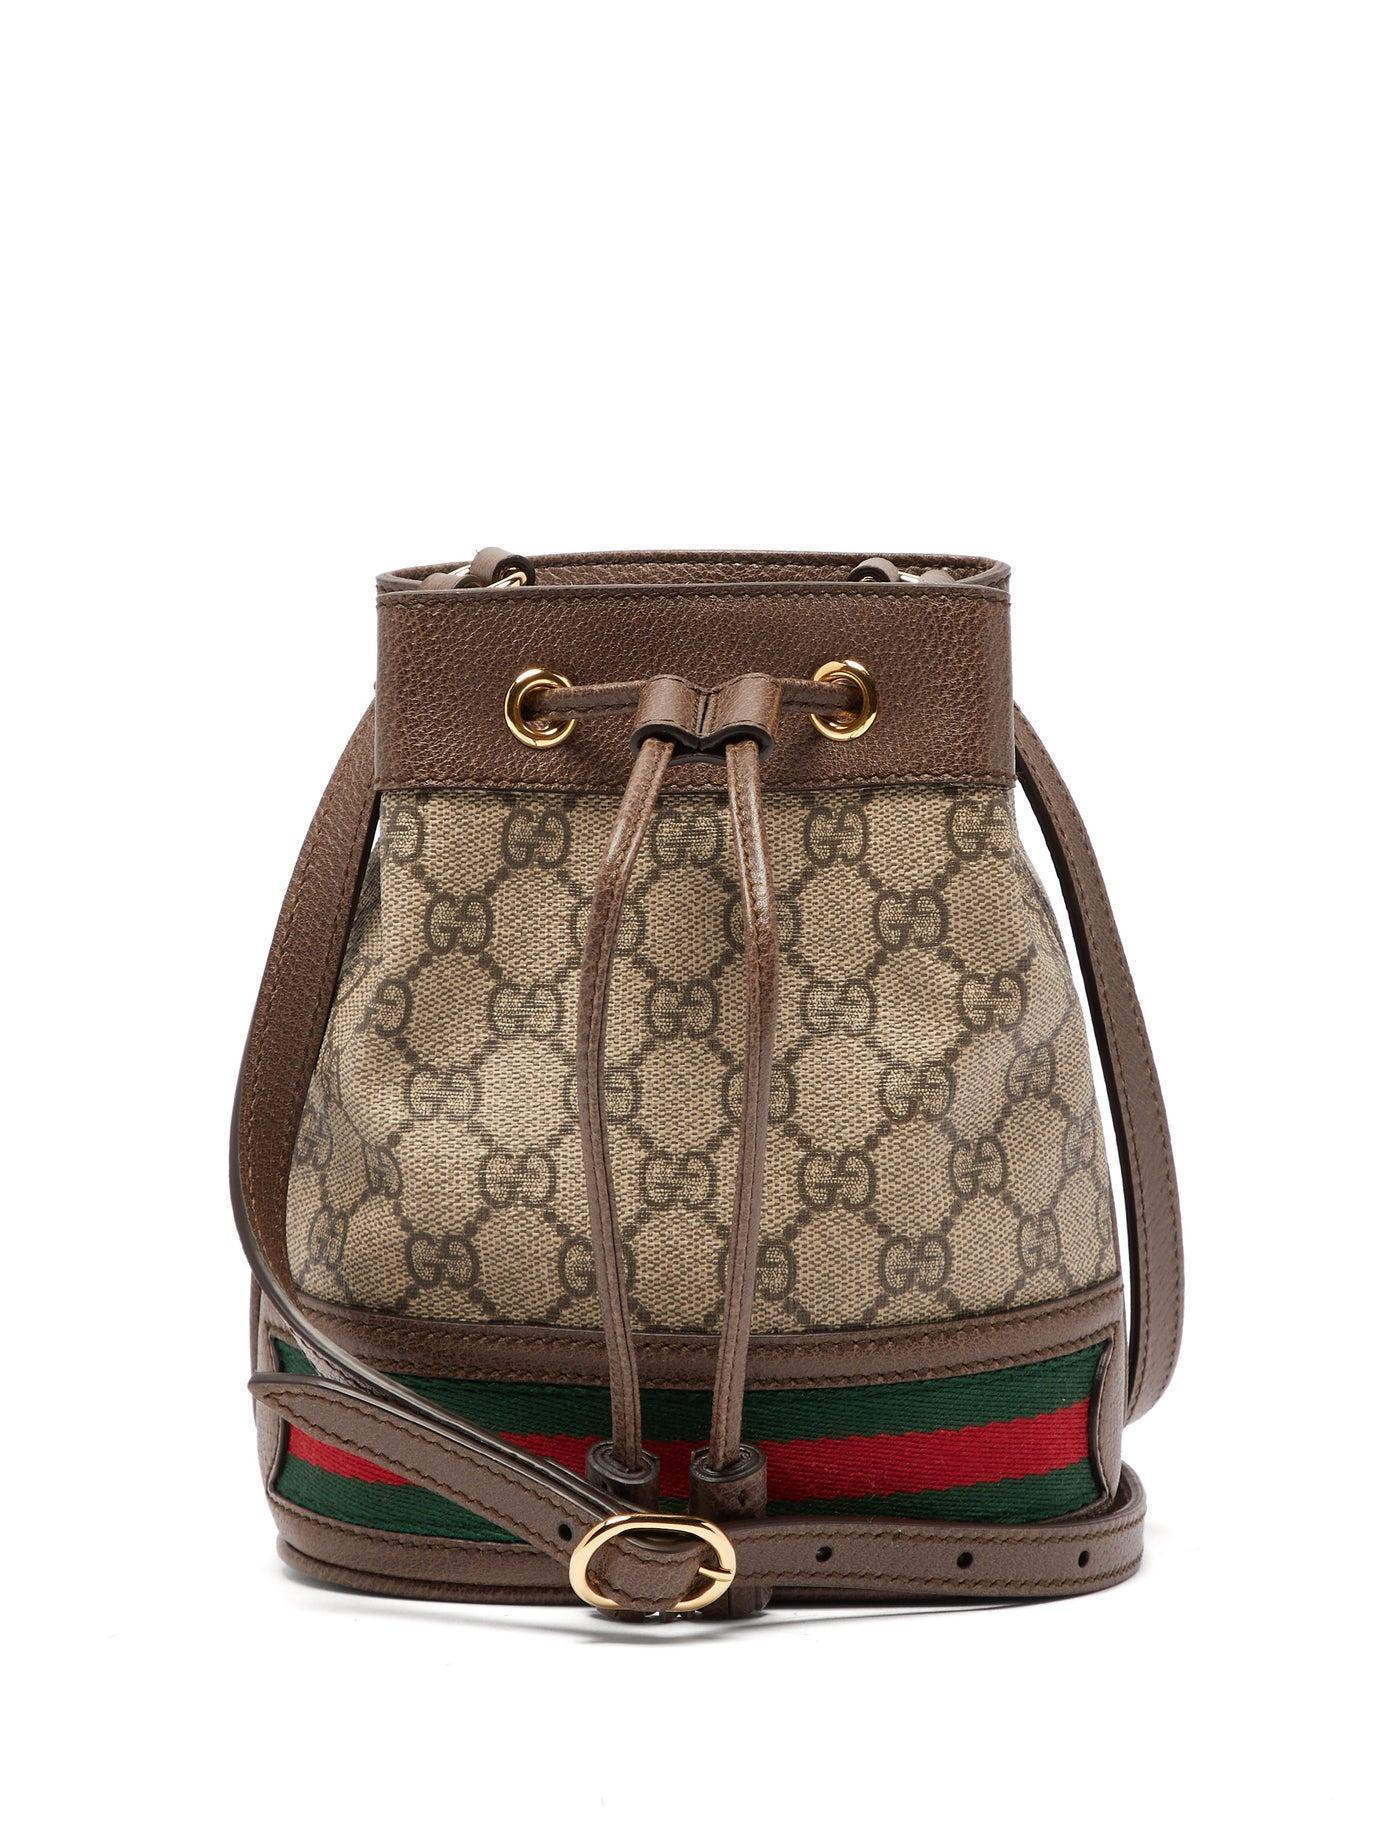 d32d6ef0d949 Gucci. Women's Ophidia Mini Gg & Web Stripe Canvas Bucket Bag